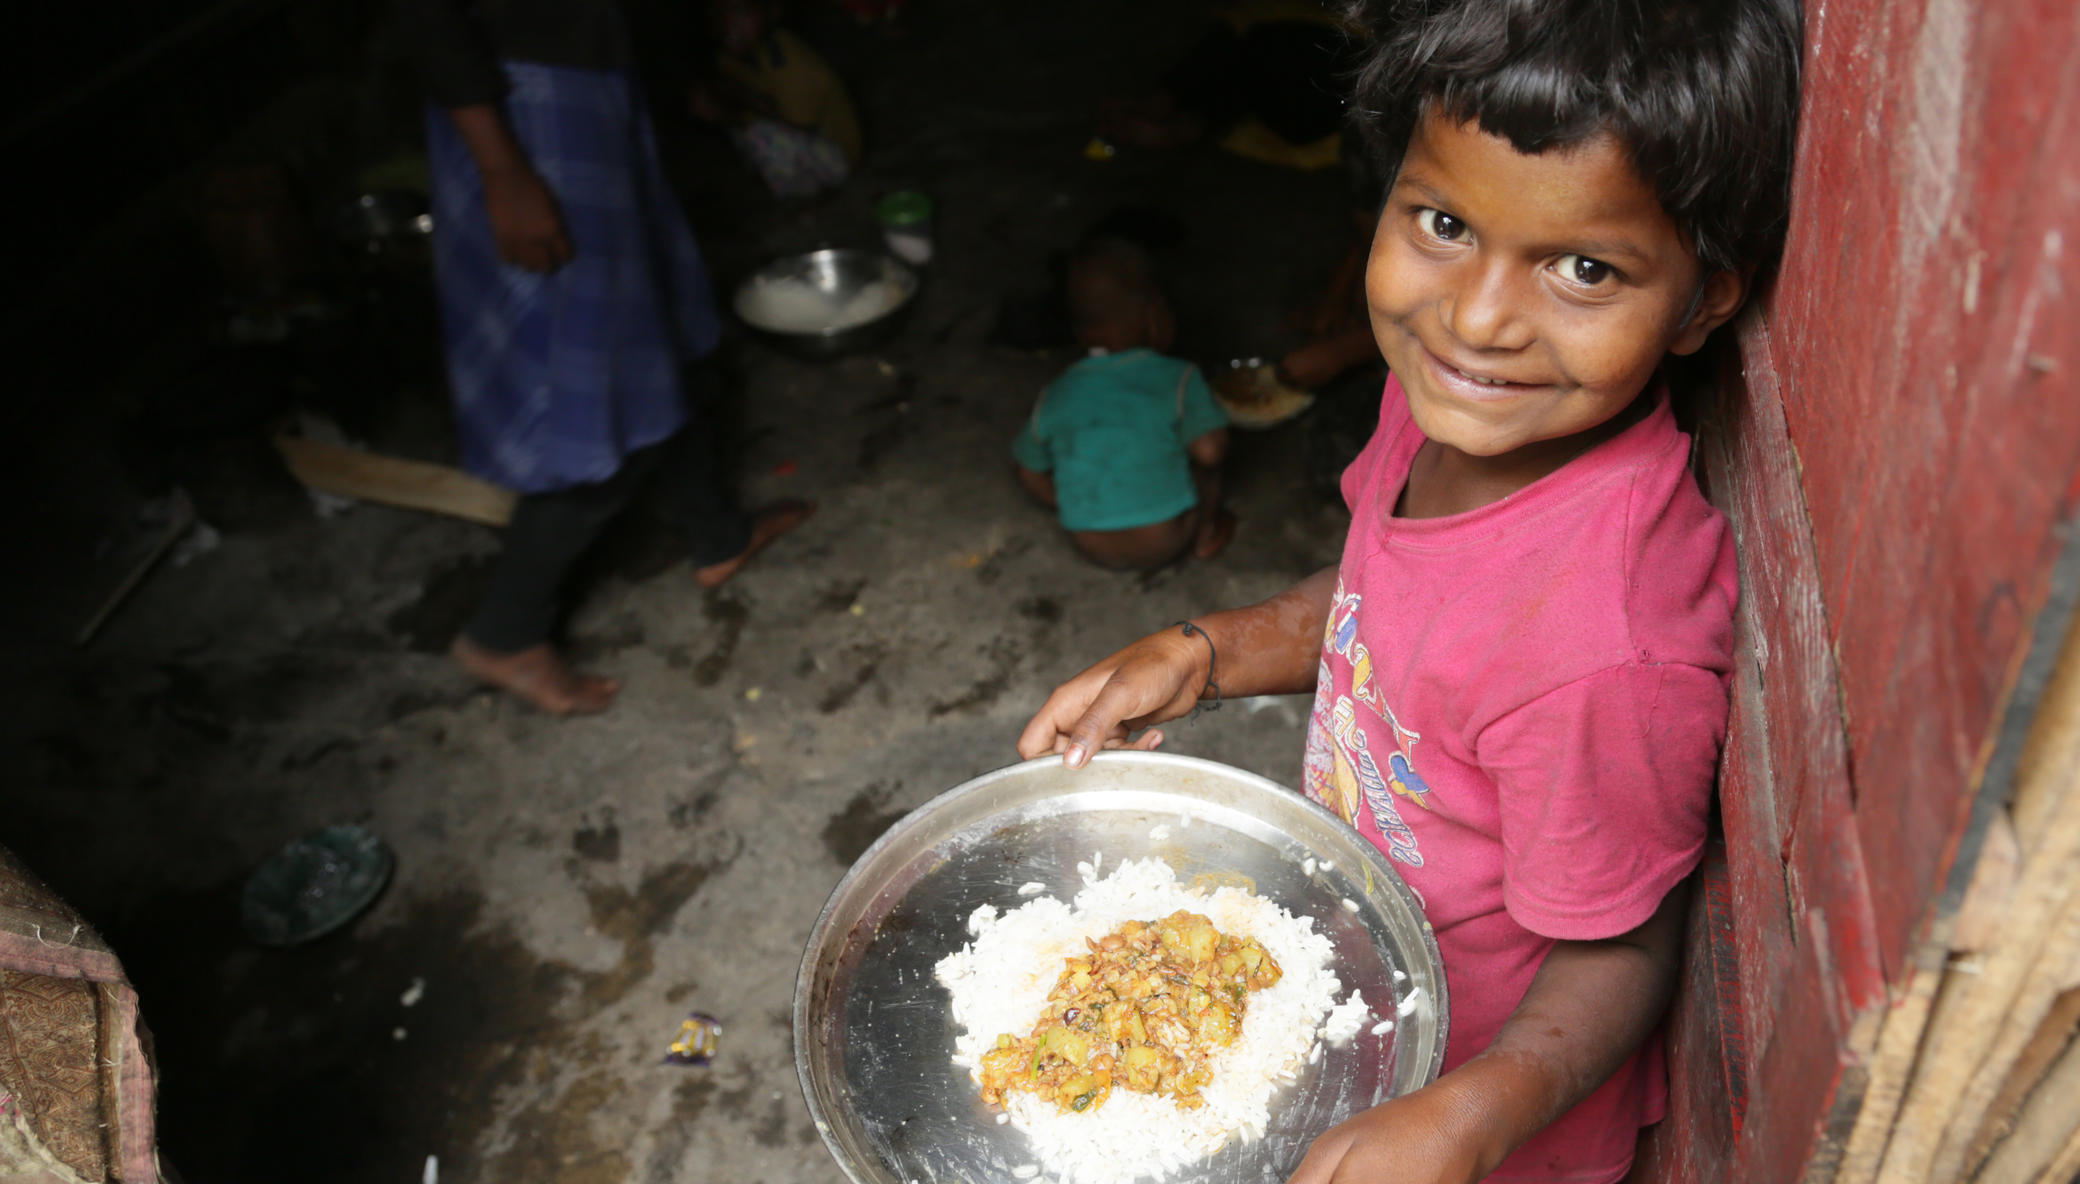 Covid-19: Food for street children in Mumbai